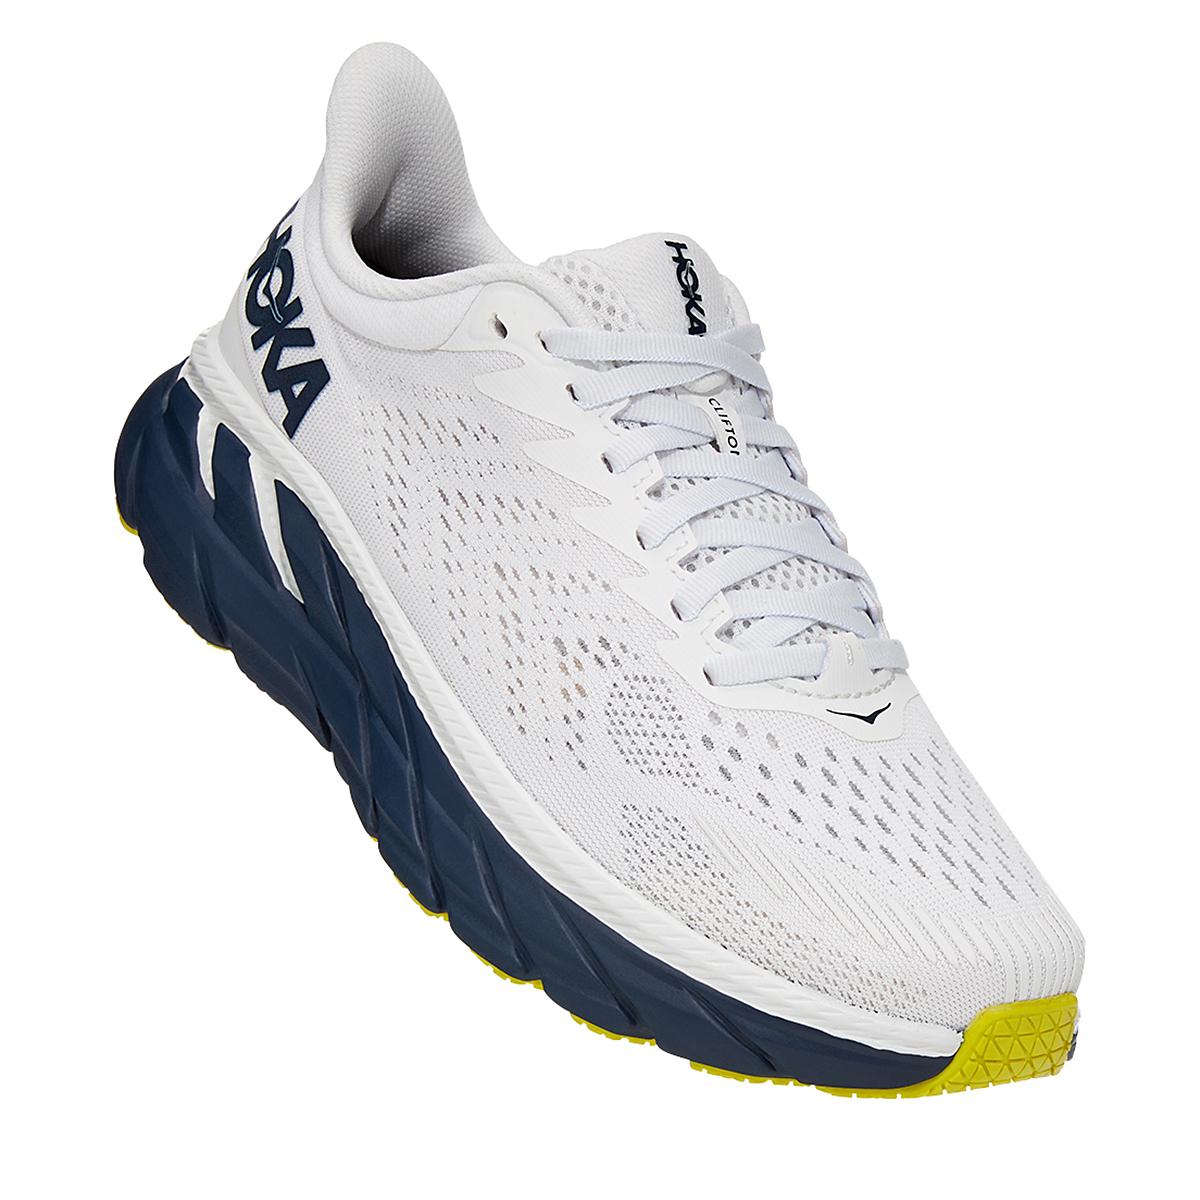 Women's Hoka One One Clifton 7 Running Shoe - Color: Blanc De Blanc - Size: 5 - Width: Regular, Blanc De Blanc, large, image 5